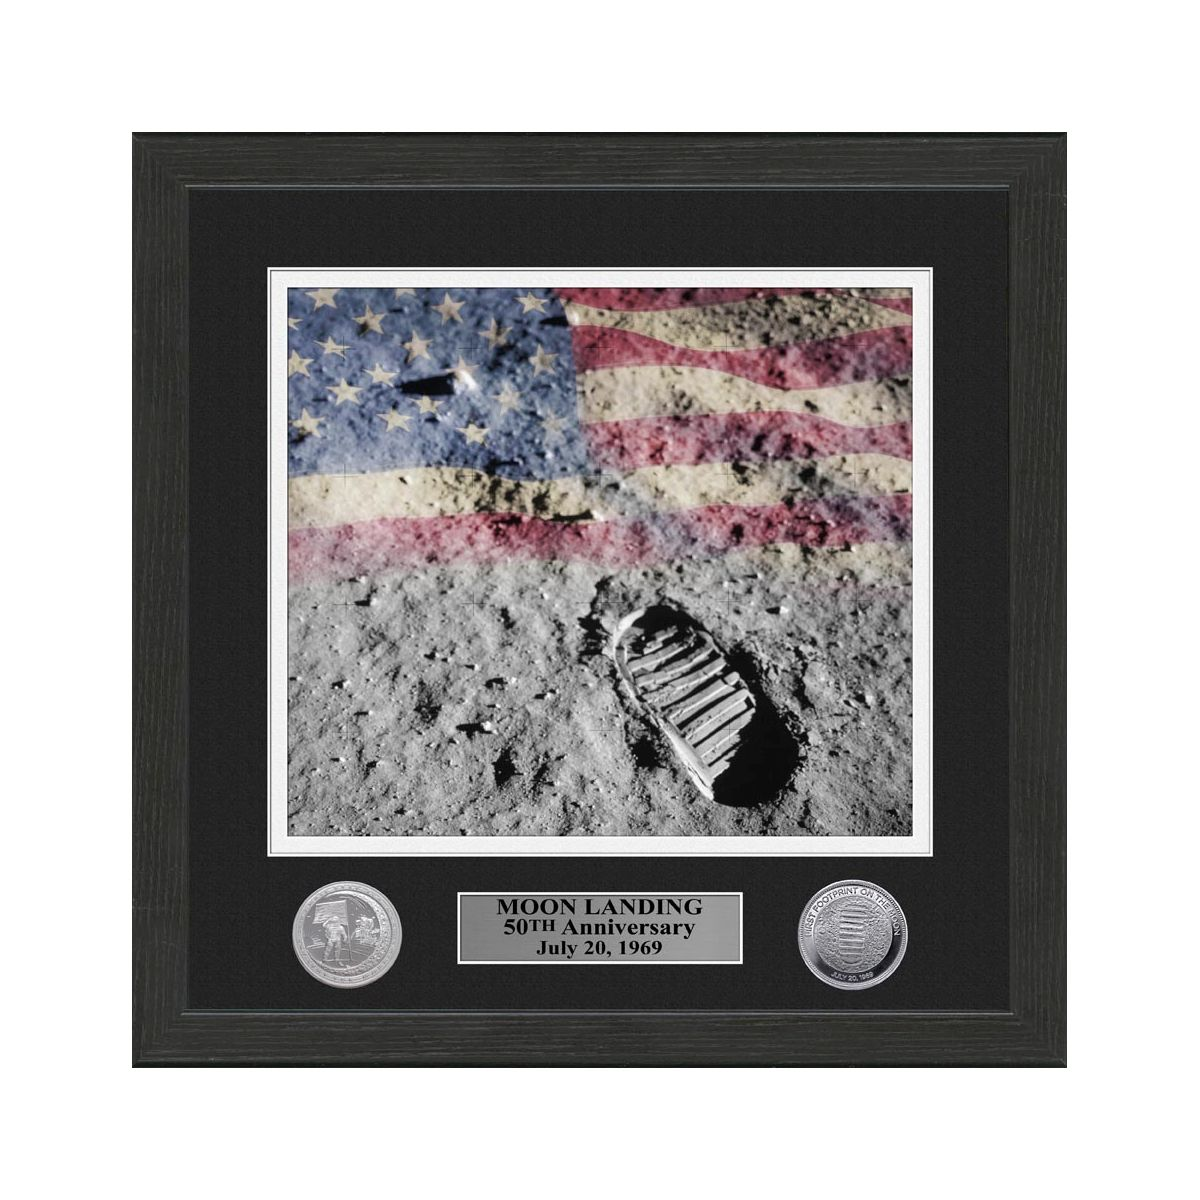 Moon Landing 50th Anniversary Photomint